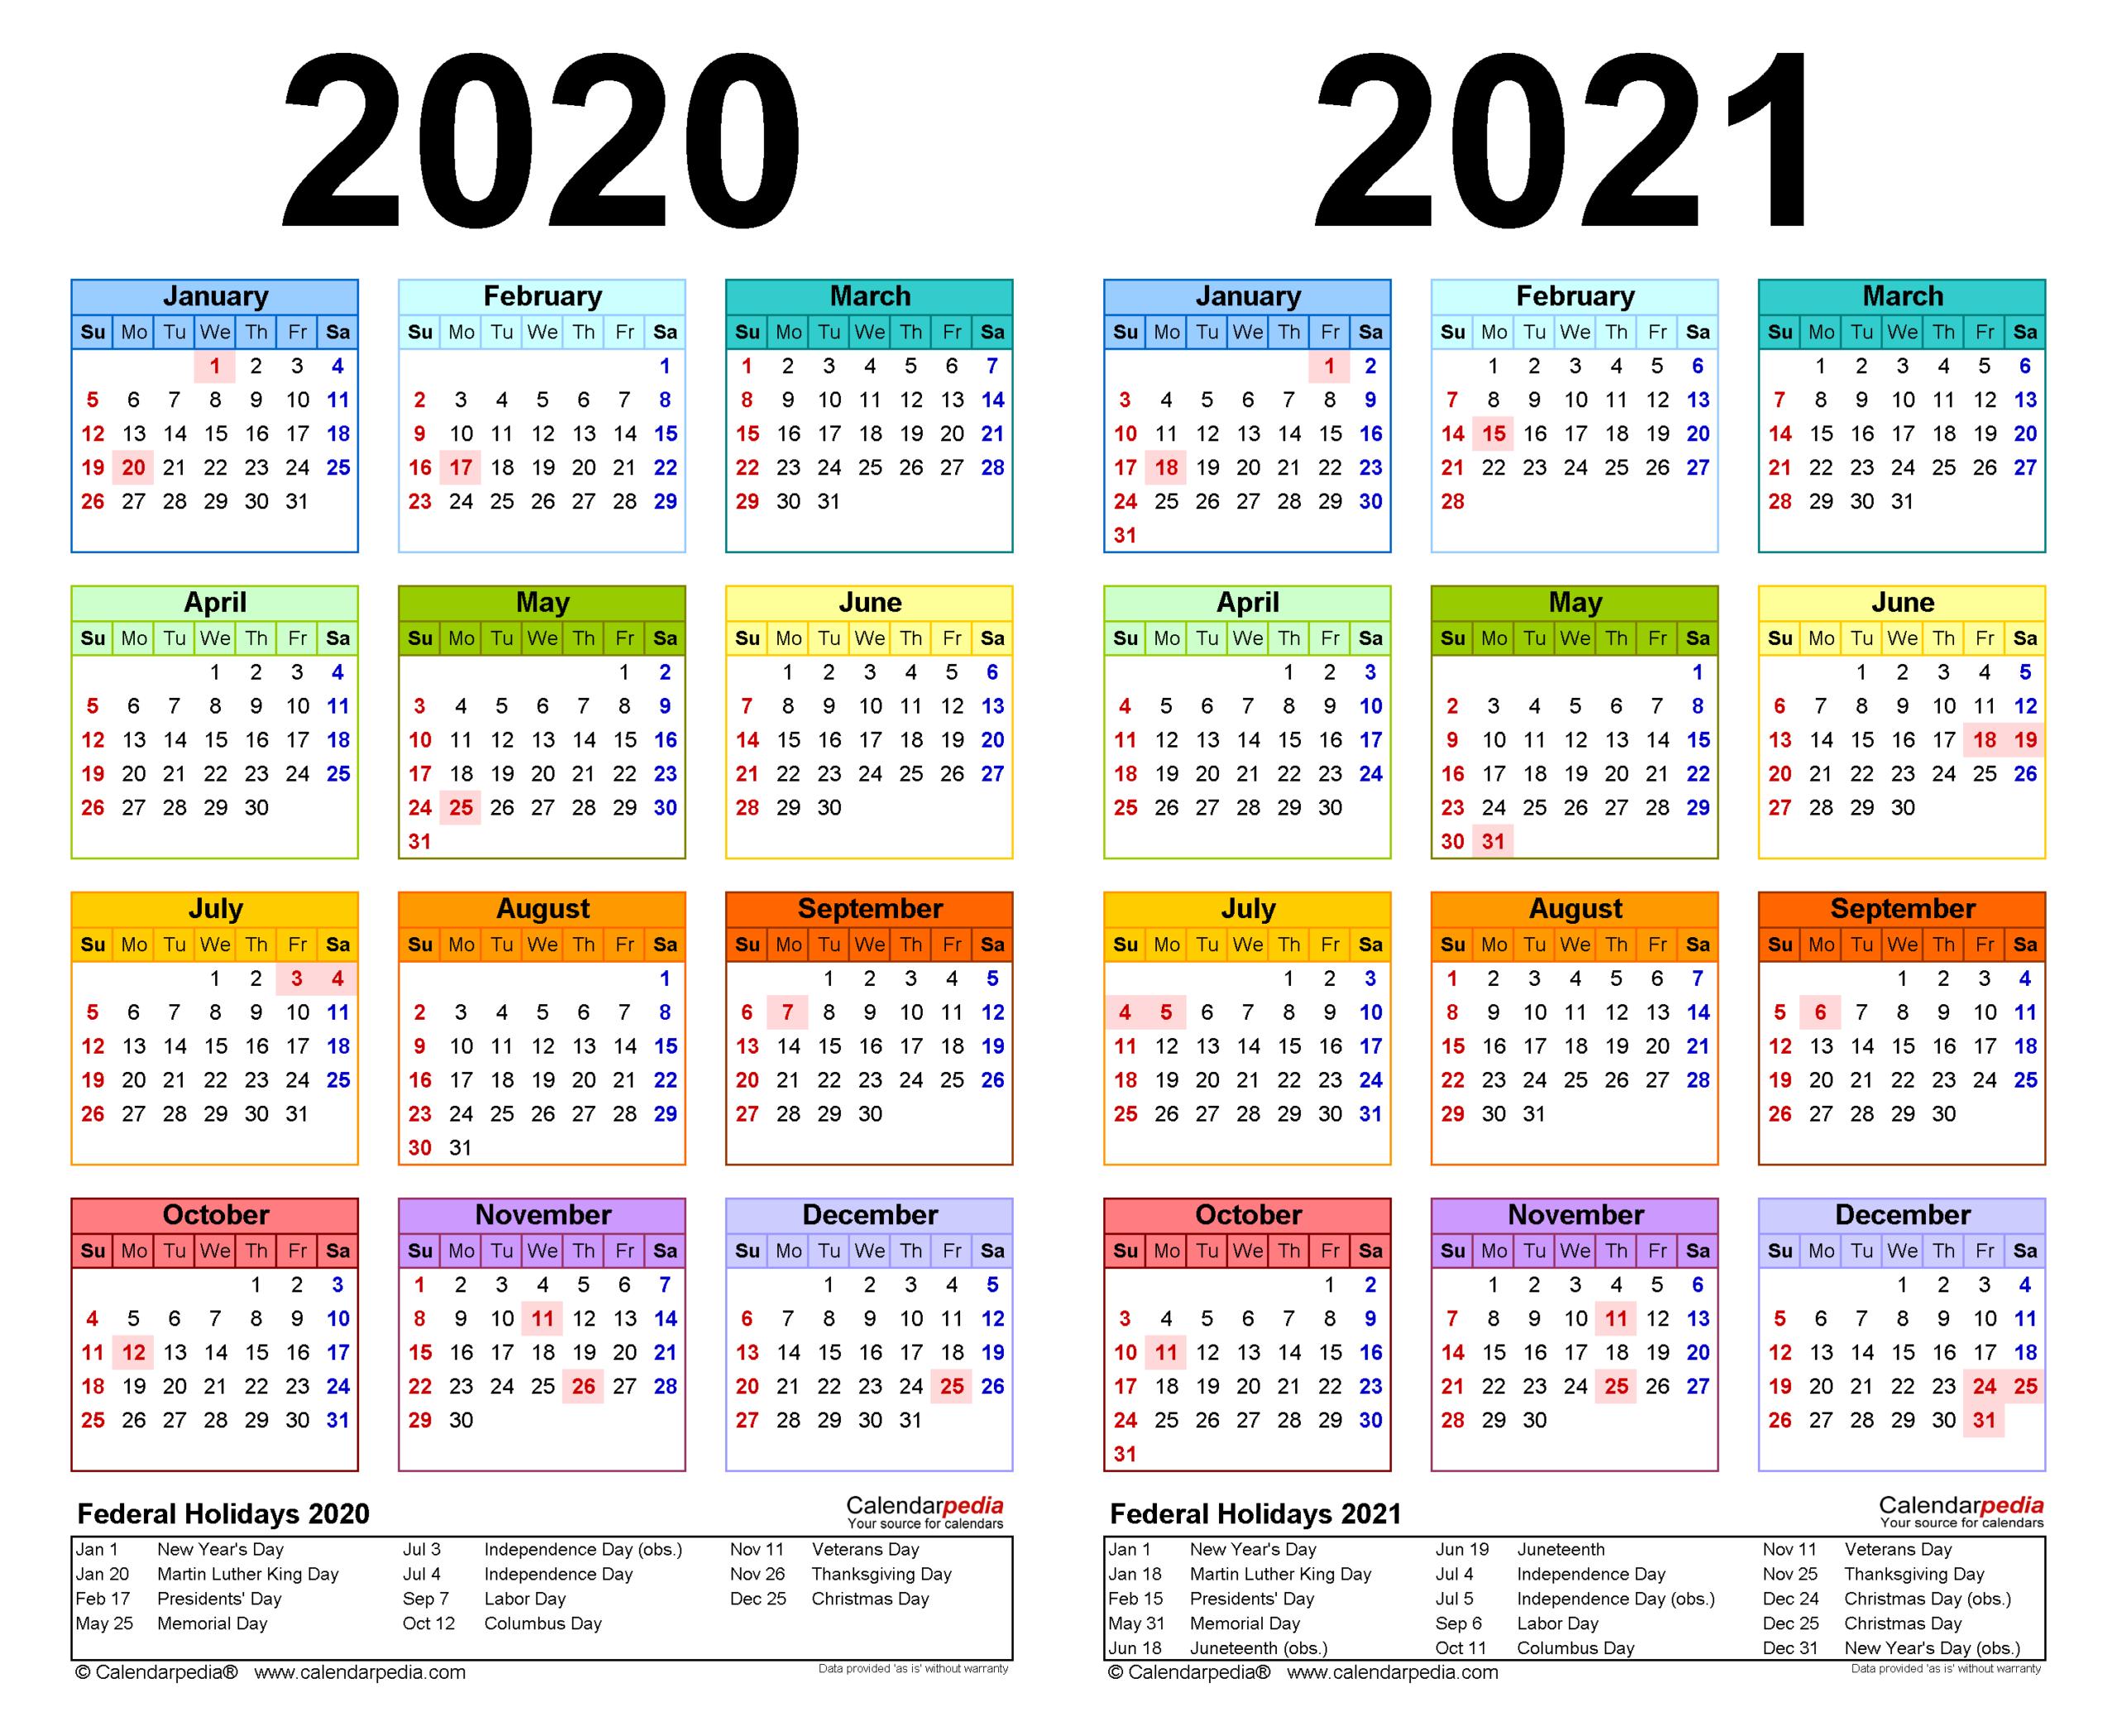 2020-2021 Two Year Calendar - Free Printable Word Templates-2 Page Printable Yearly Calendar Template 2021